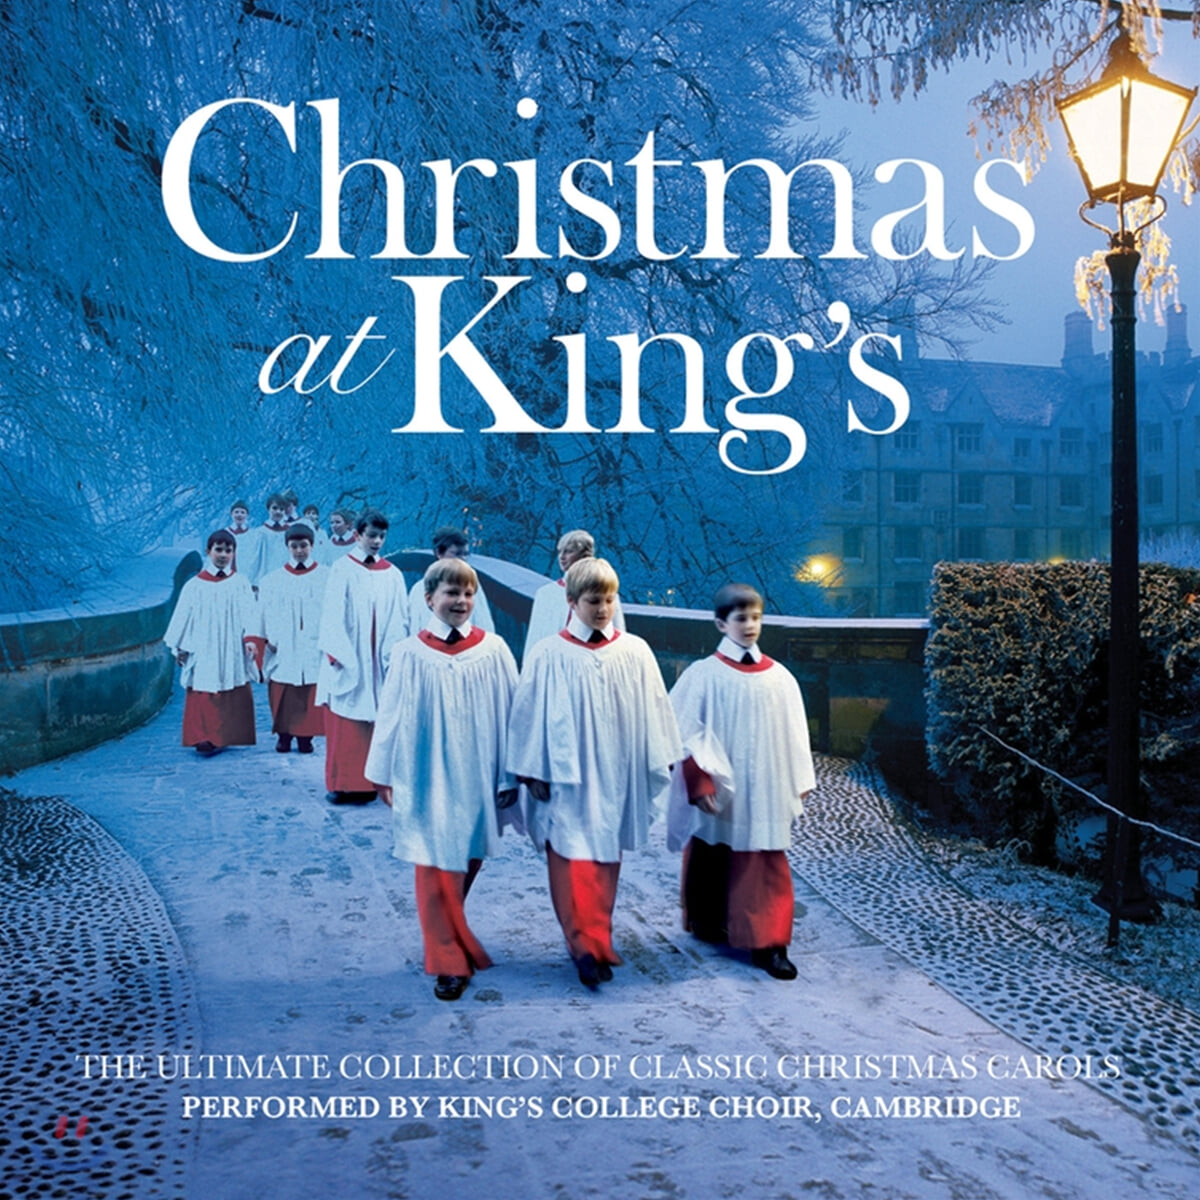 King's College Choir of Cambridge 킹스 칼리지의 성탄음악 (Christmas at King's) [화이트 컬러 LP]